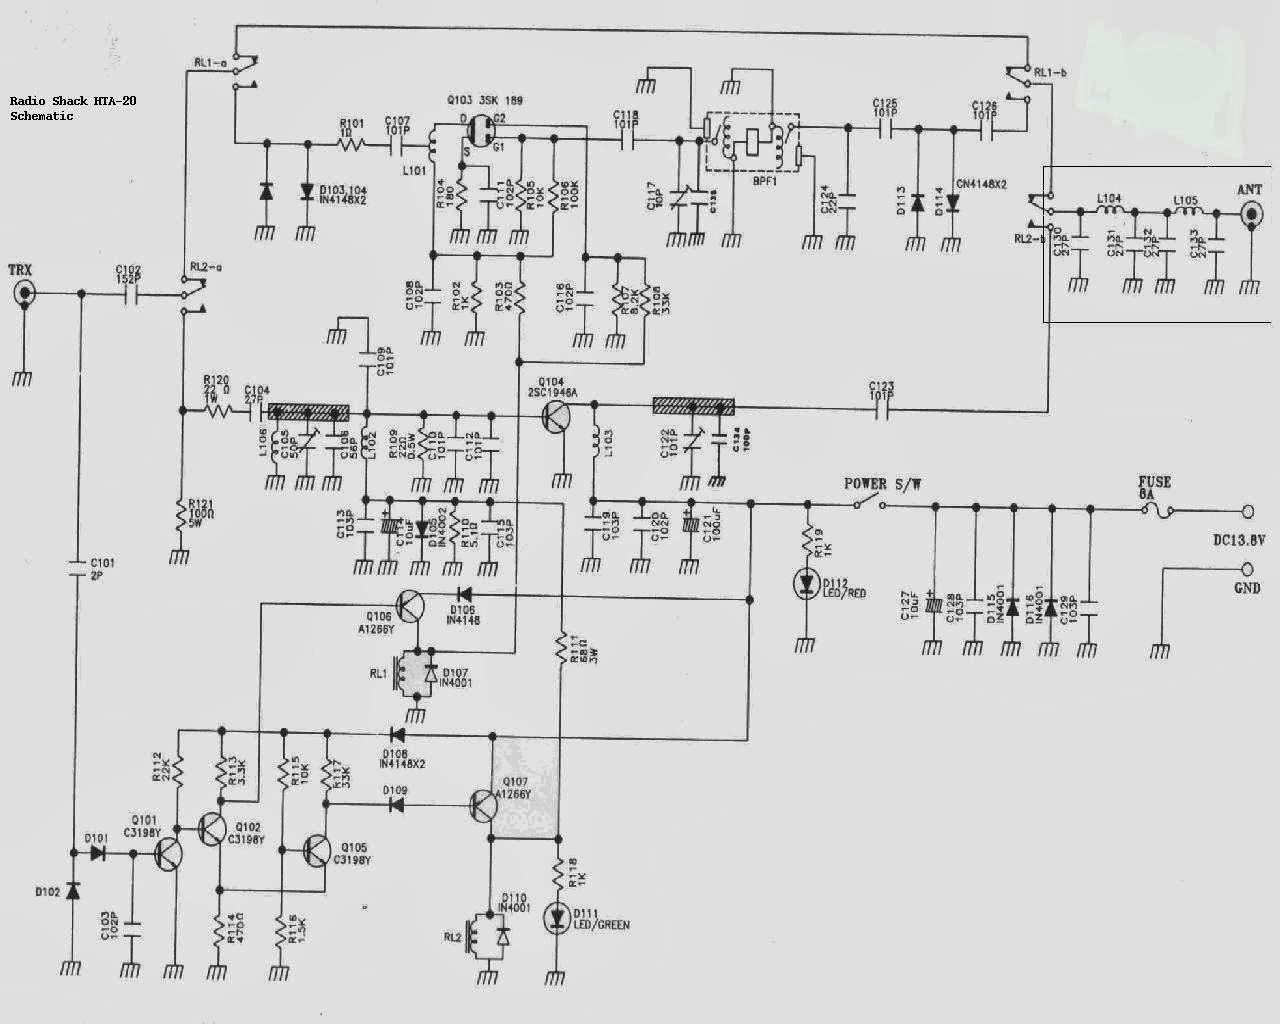 Hta Wiring Diagram - Example Electrical Wiring Diagram •